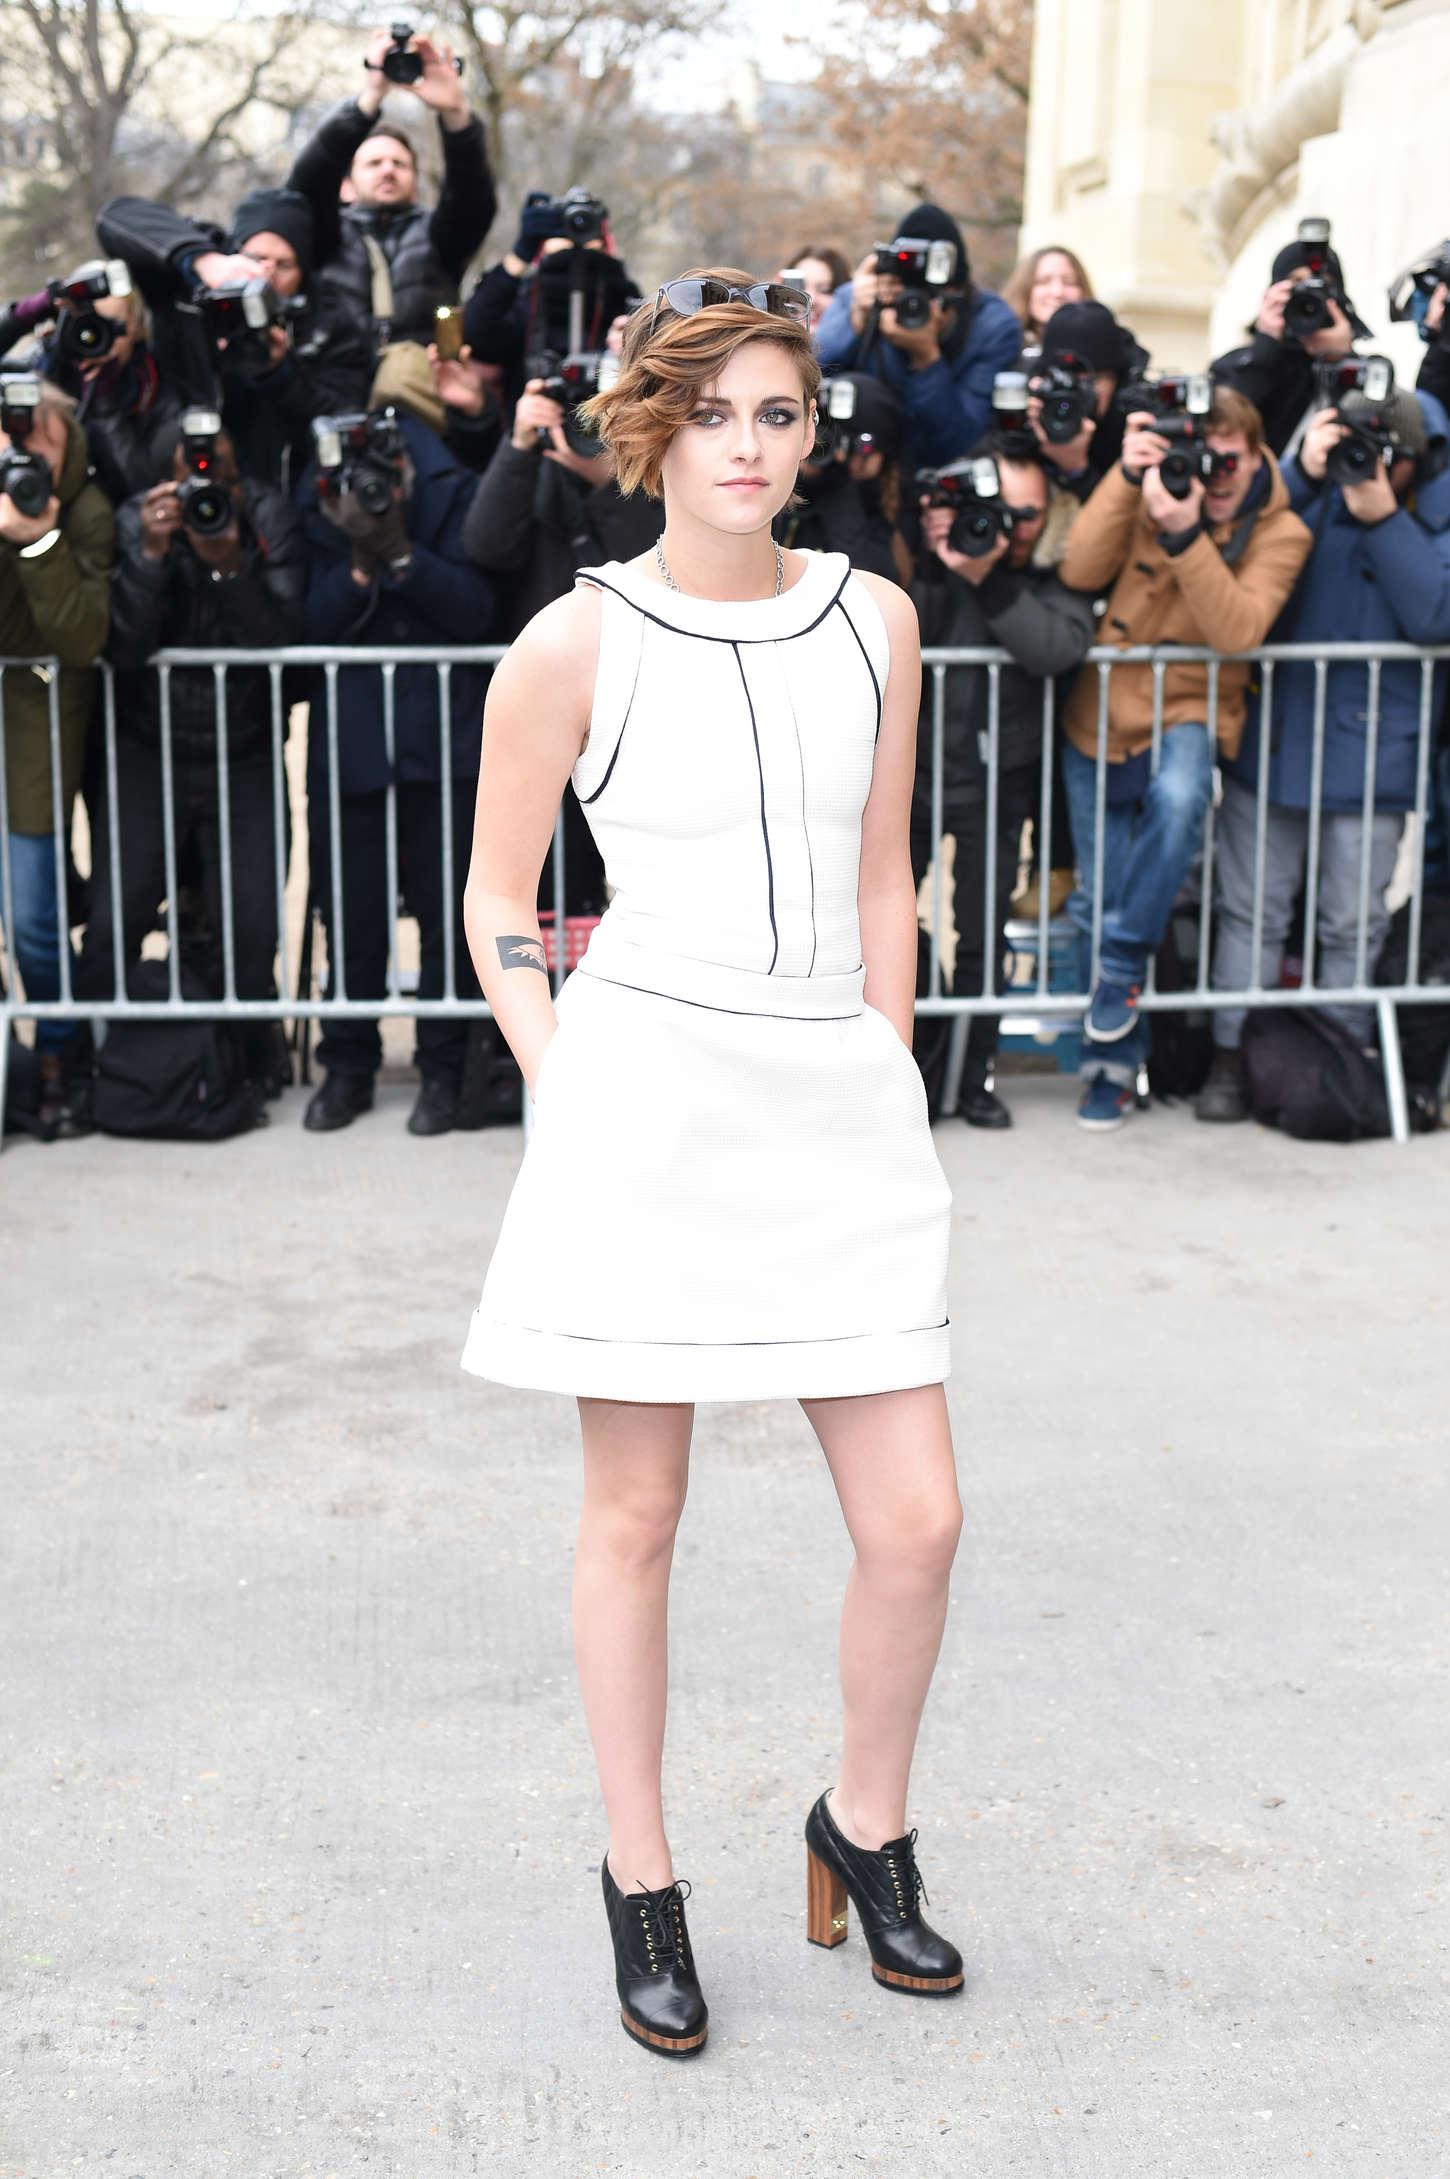 Kristen Stewart Chanel Fashion Show 2015 02 Gotceleb